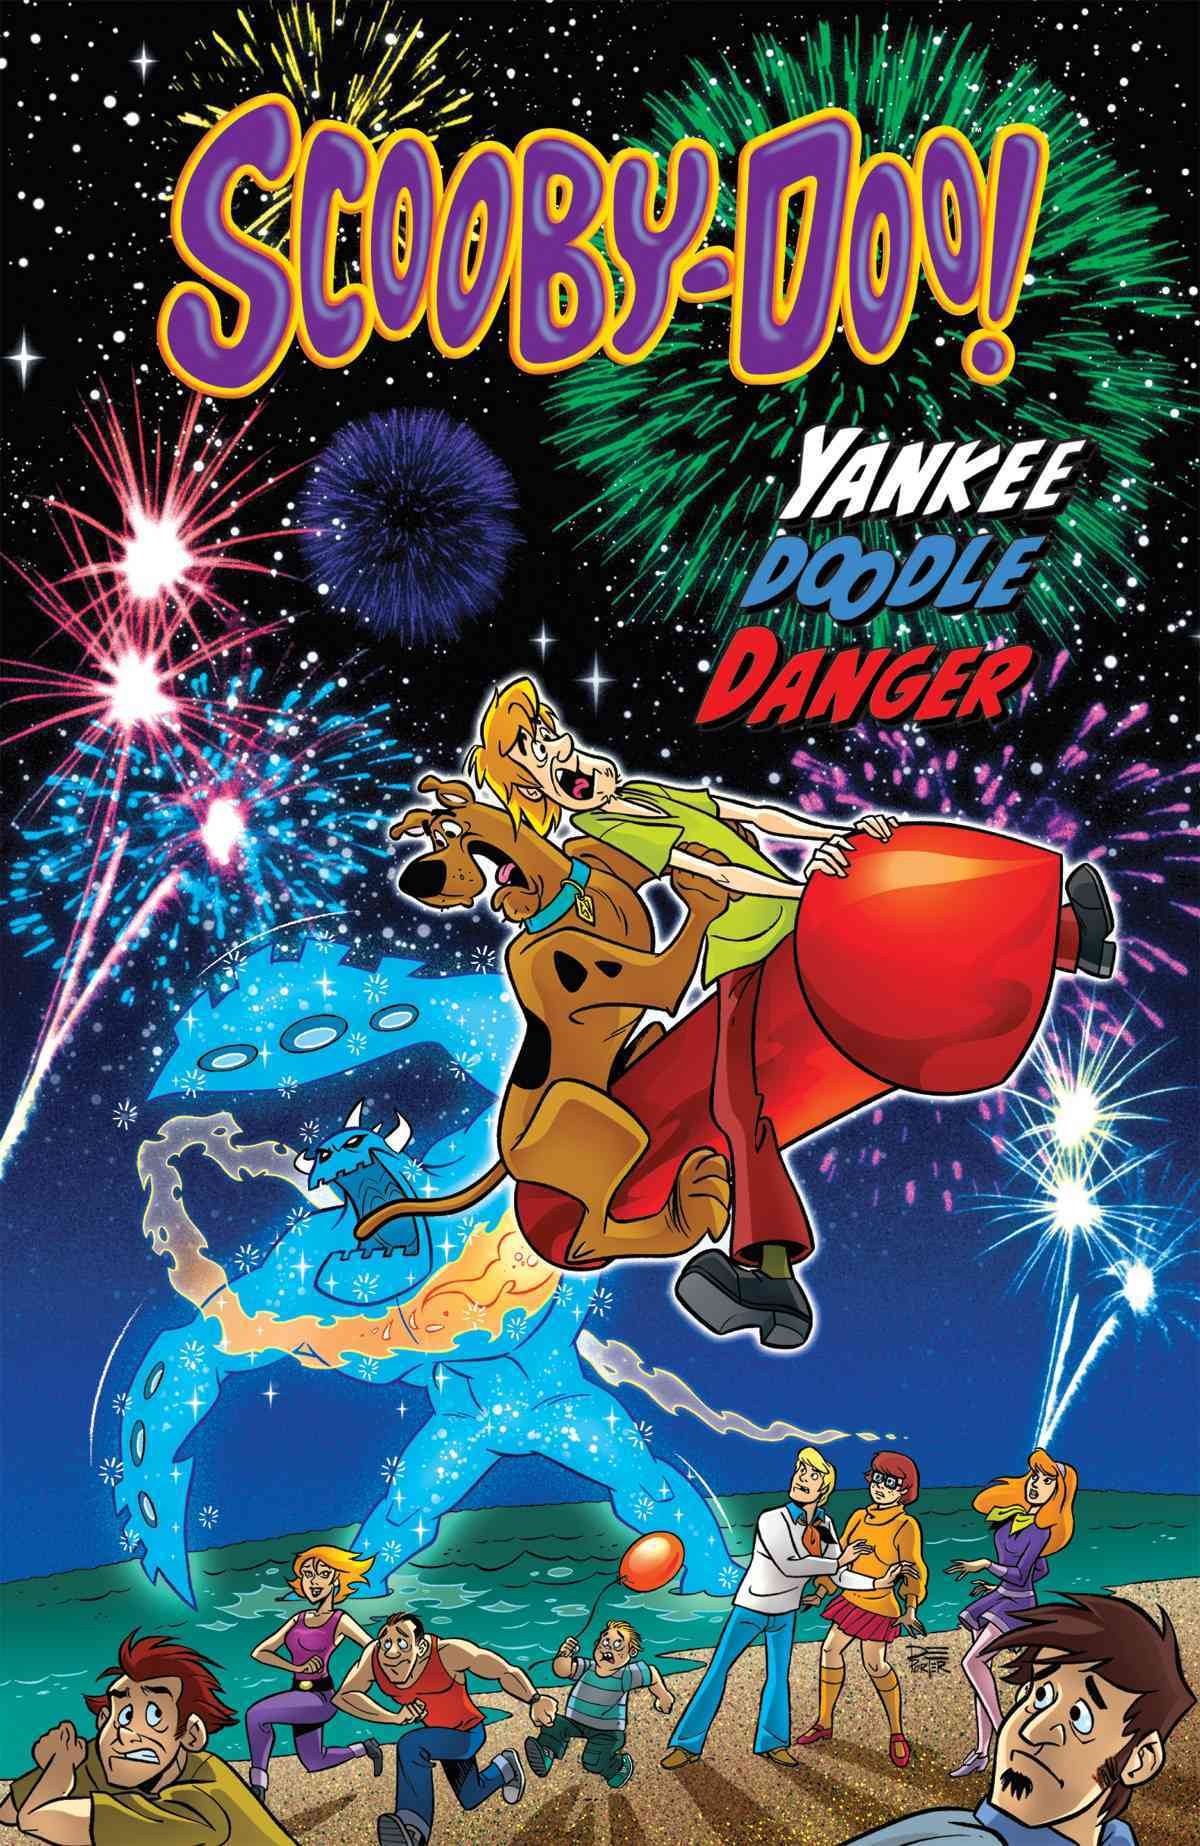 Scooby-Doo in Yankee Doodle Danger By Rozum, John